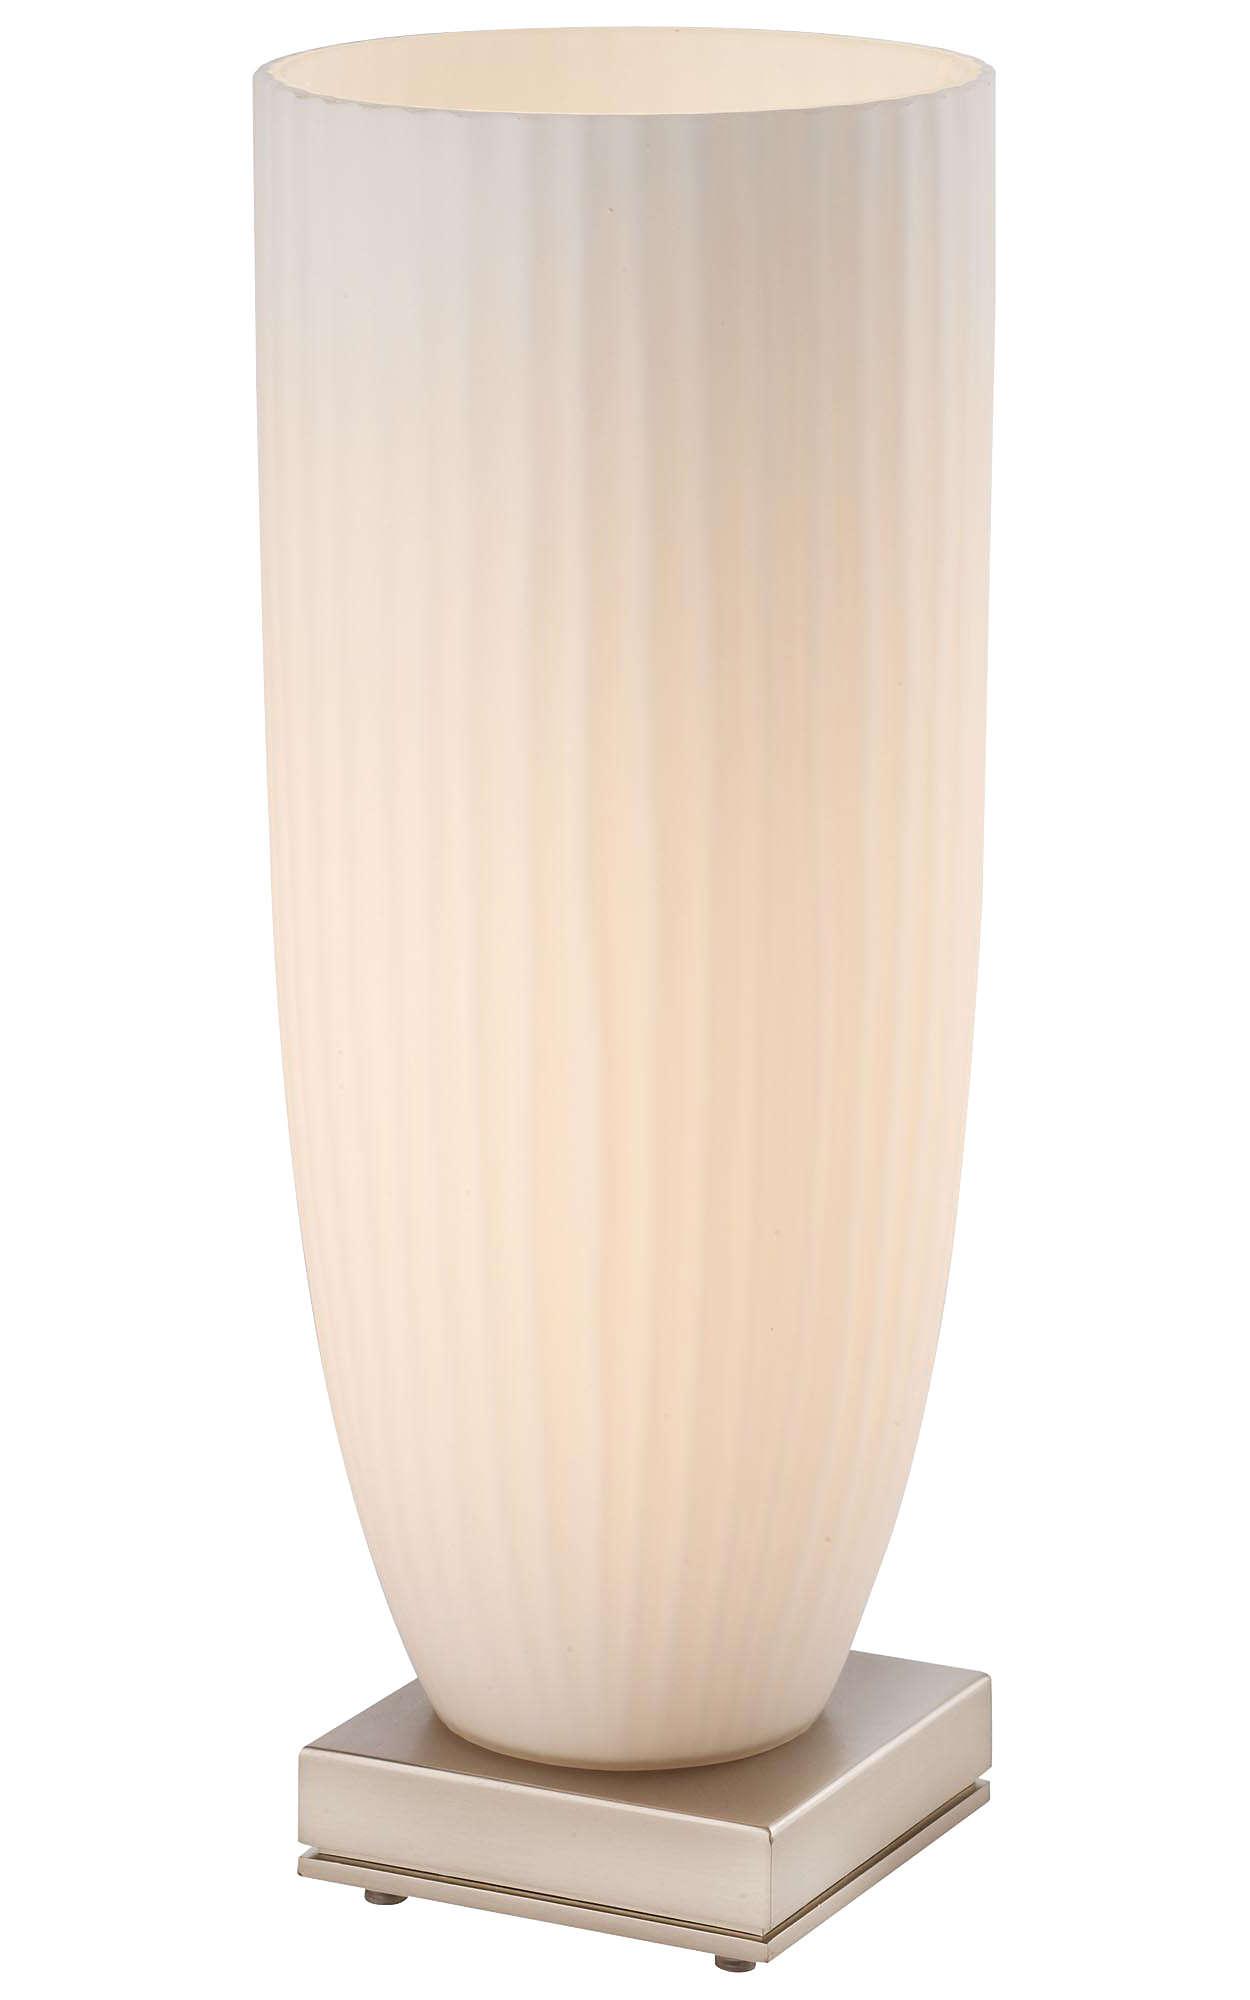 Capitola 1-light Table Lamp, Satin Nickel finish